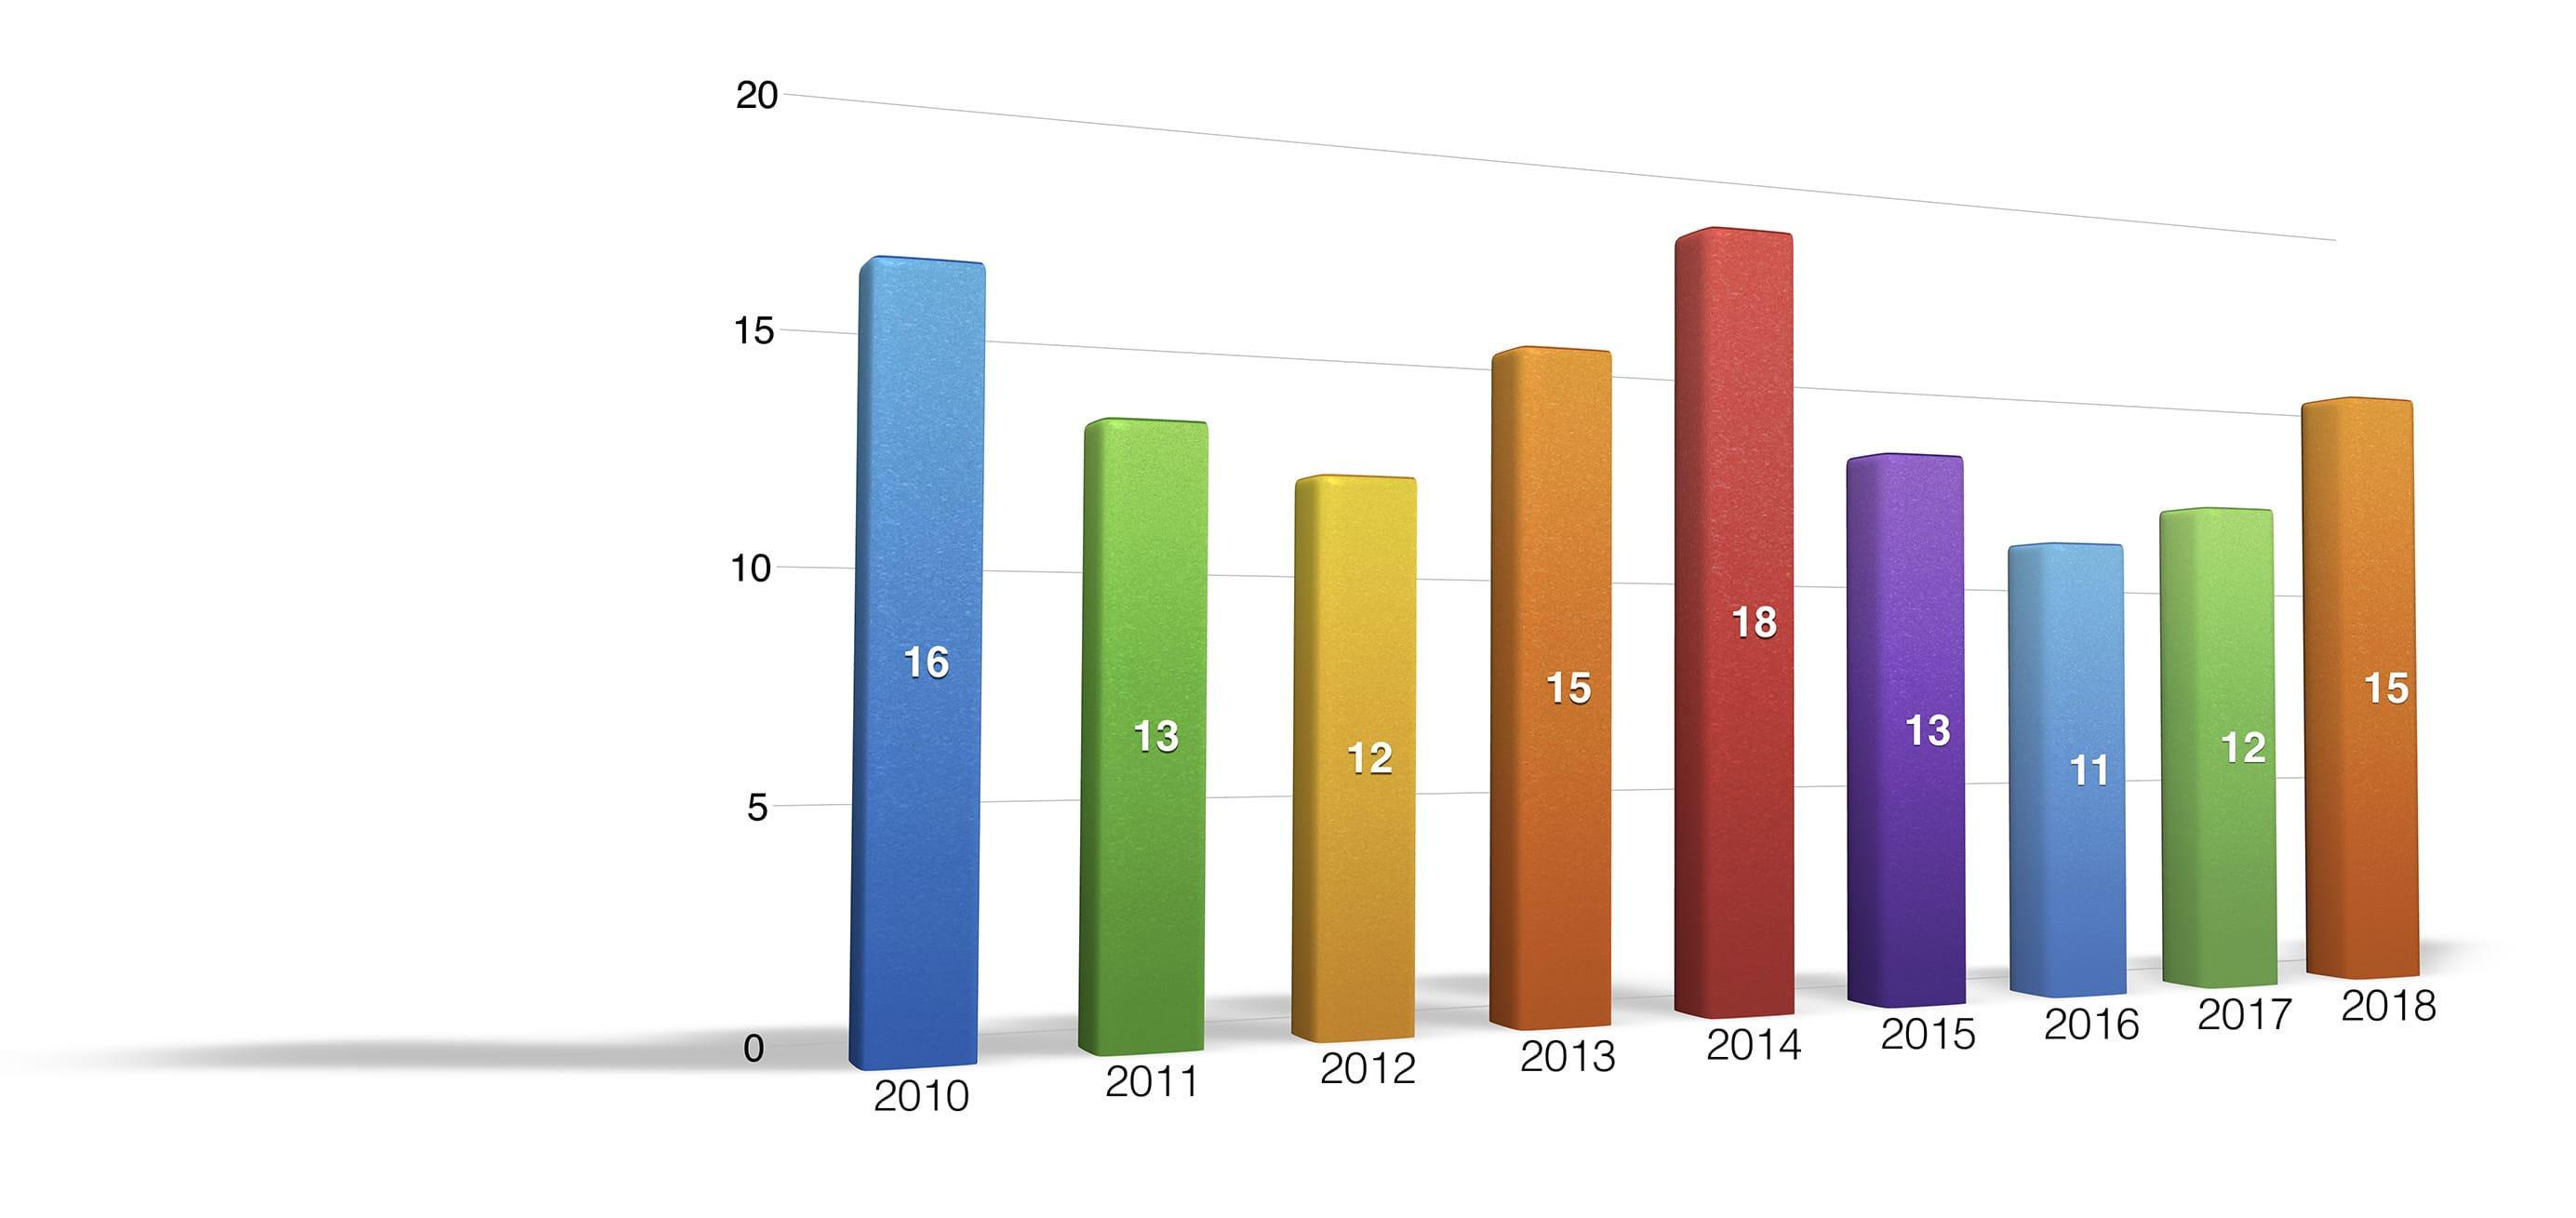 SB SETEC Turn Over 2010-2018